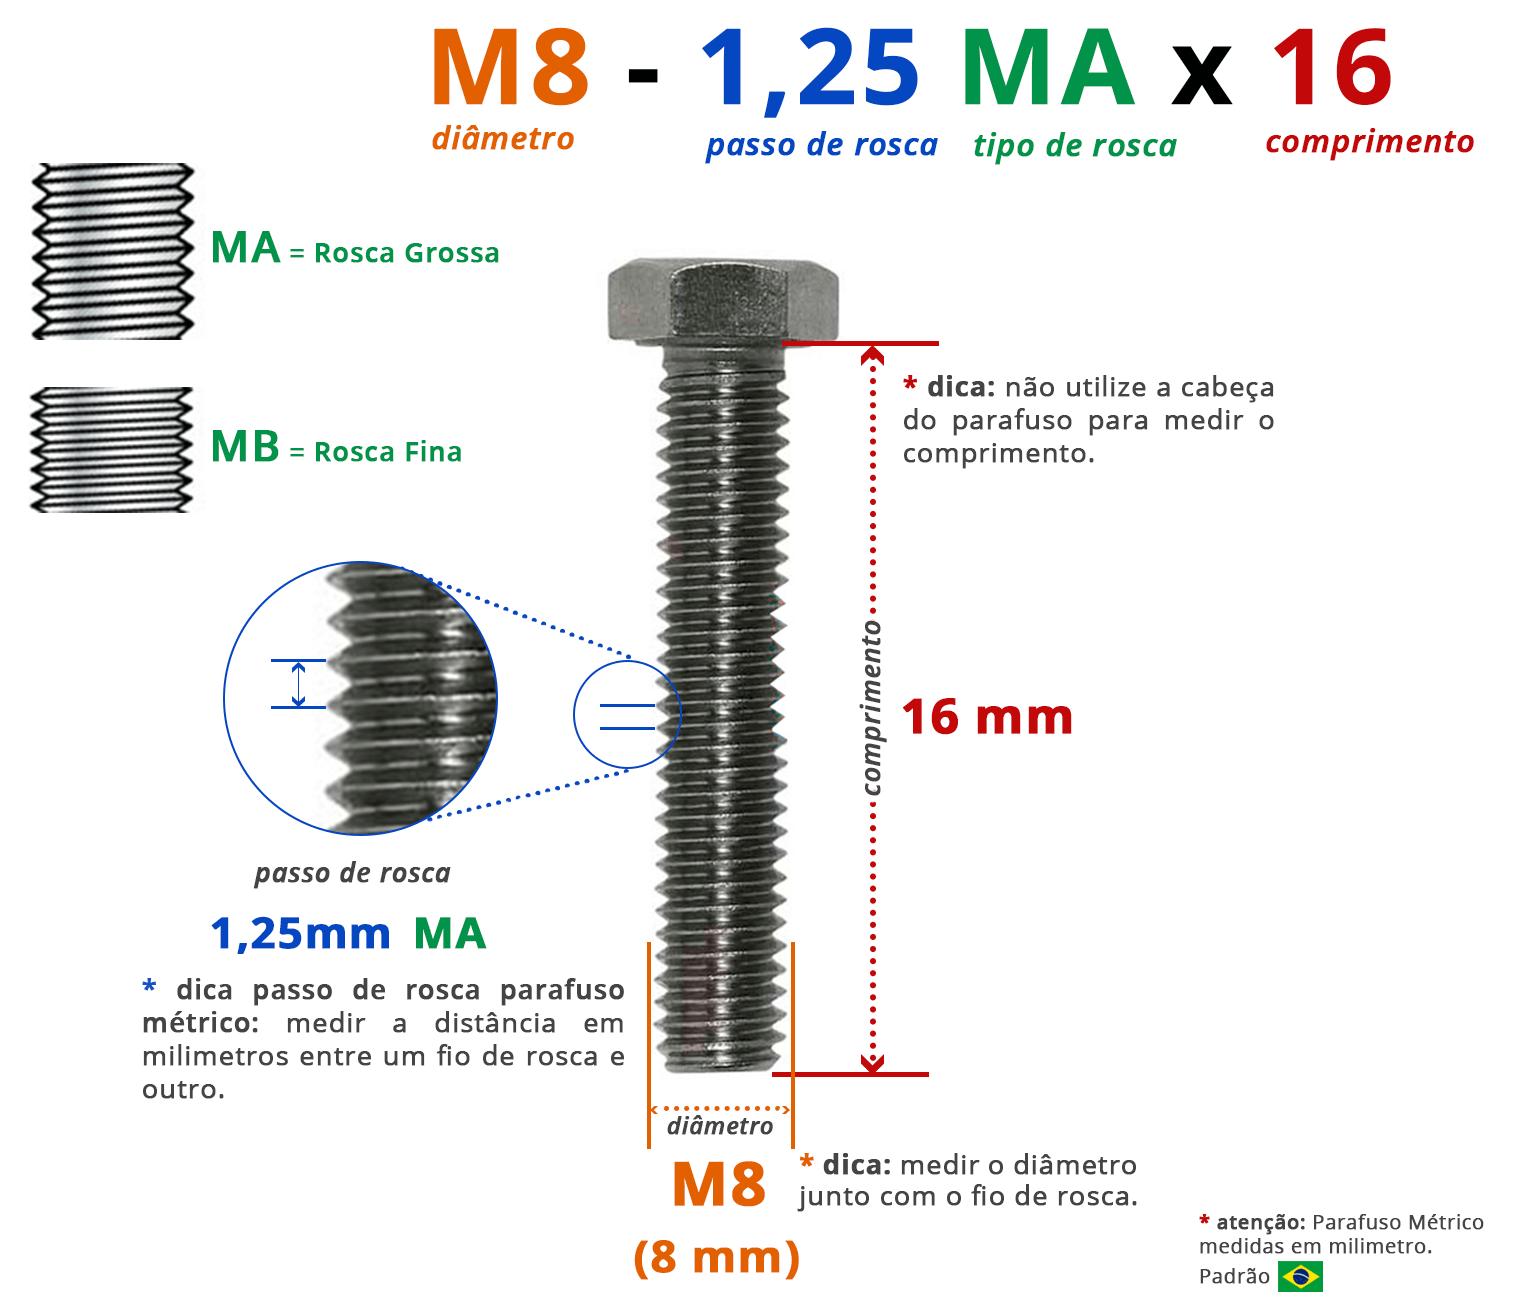 PARAFUSO SEXTAVADO ROSCA INTEIRA M8 1,25 MA X 16 DIN 933 INOX A4